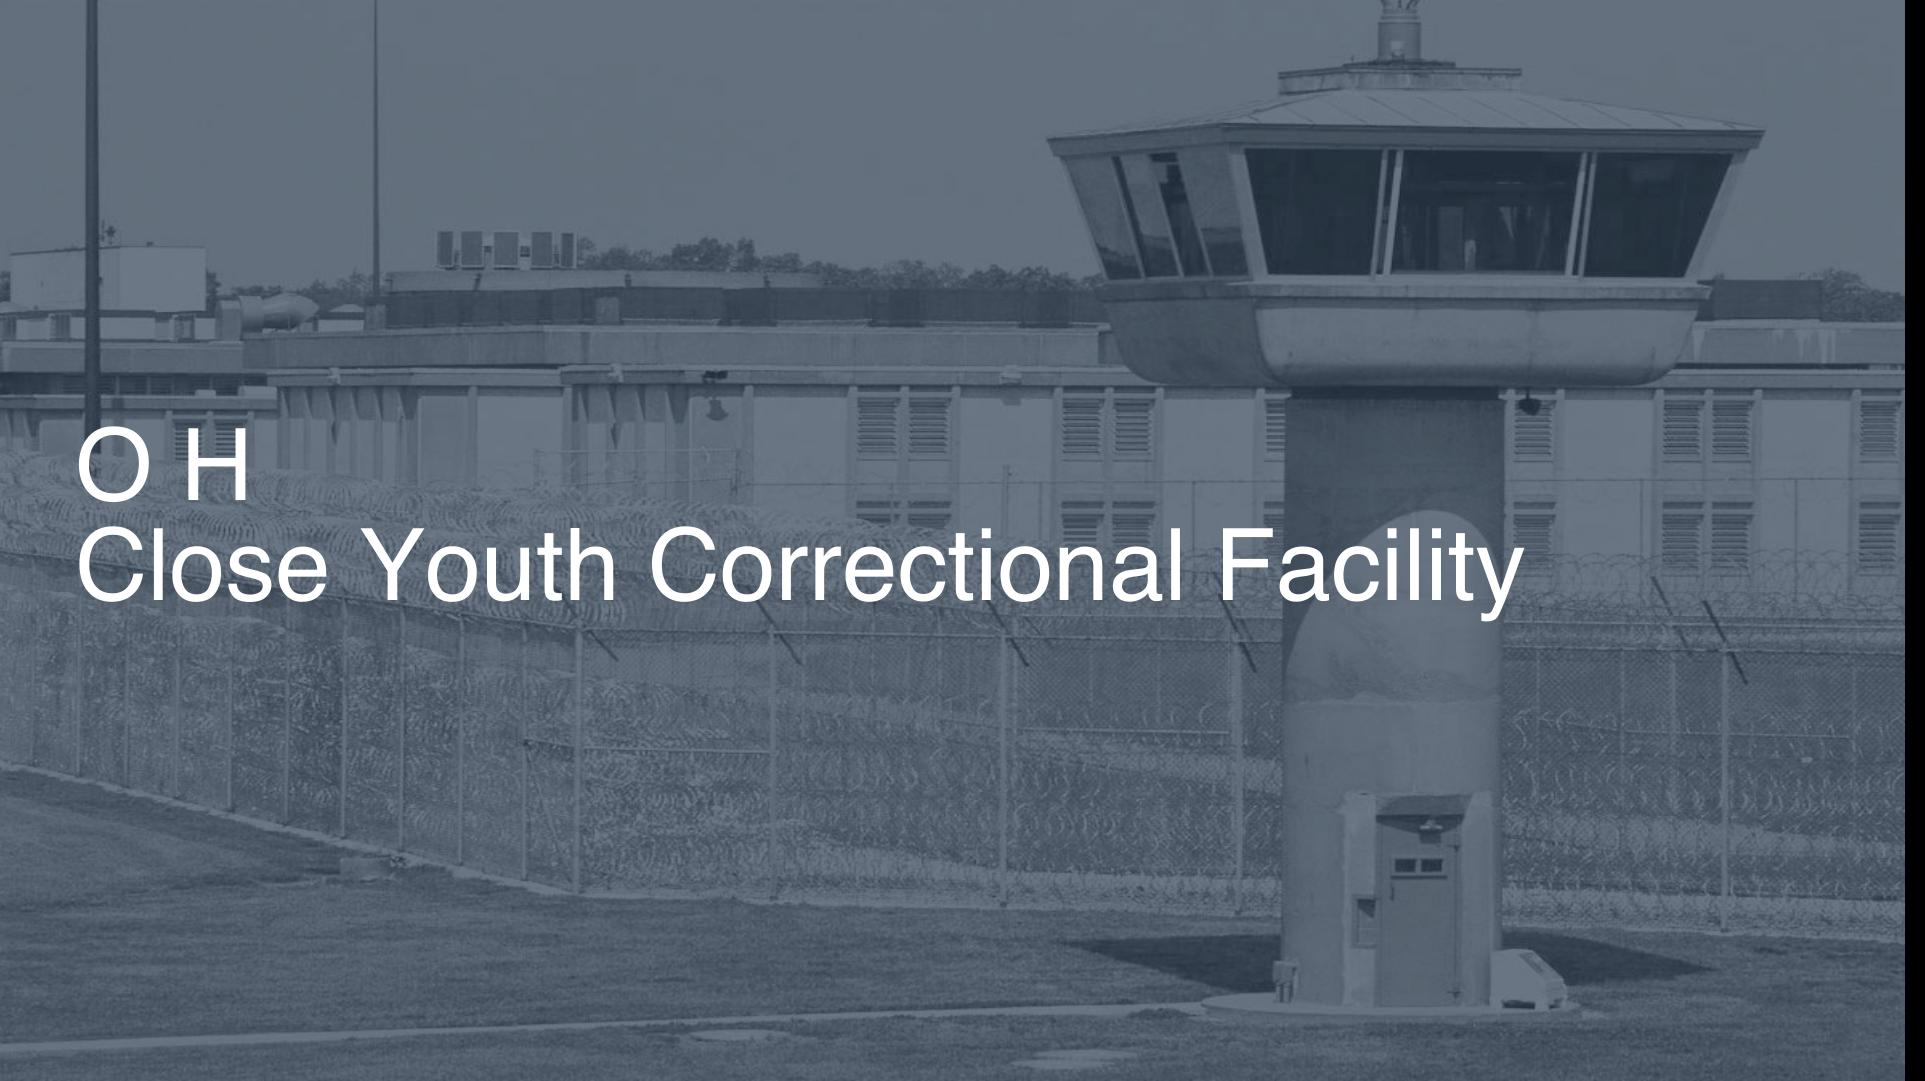 O. H. Close Youth Correctional Facility correctional facility picture